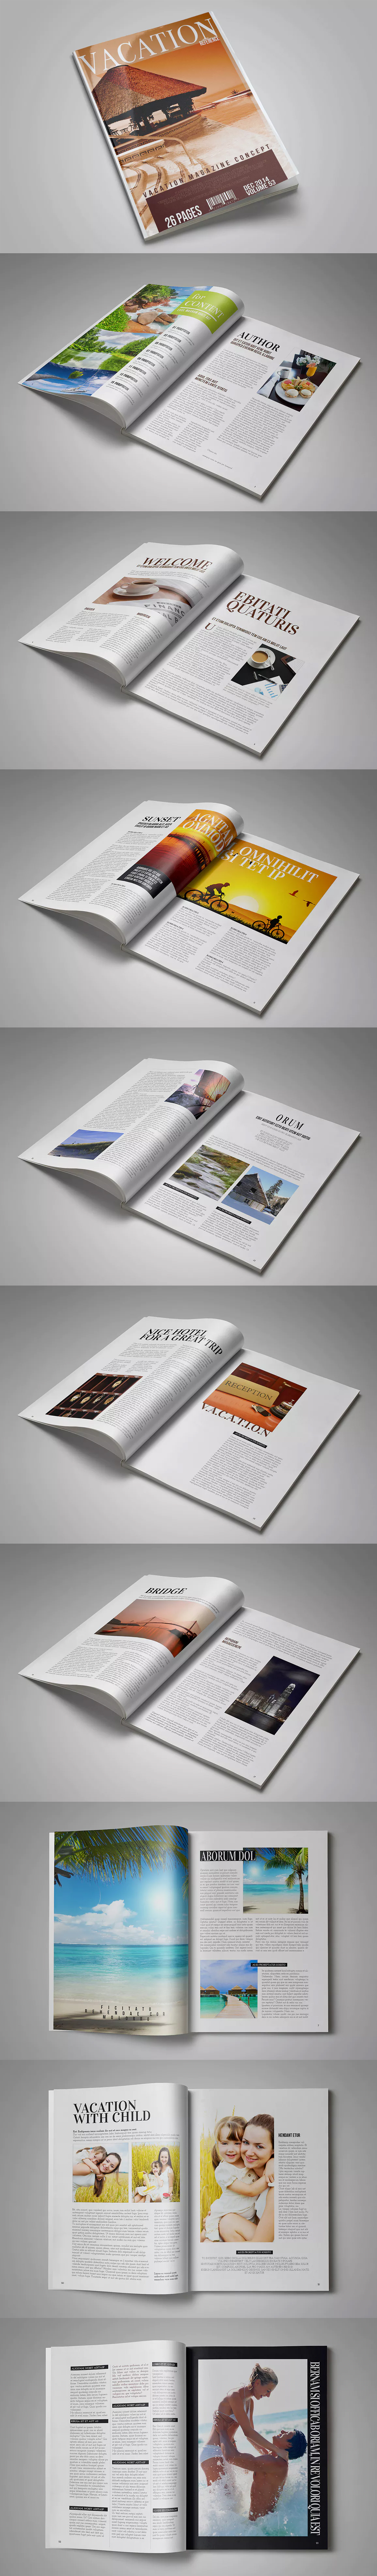 Multipurpose Magazine Template InDesign INDD A4 | Magazine Templates ...